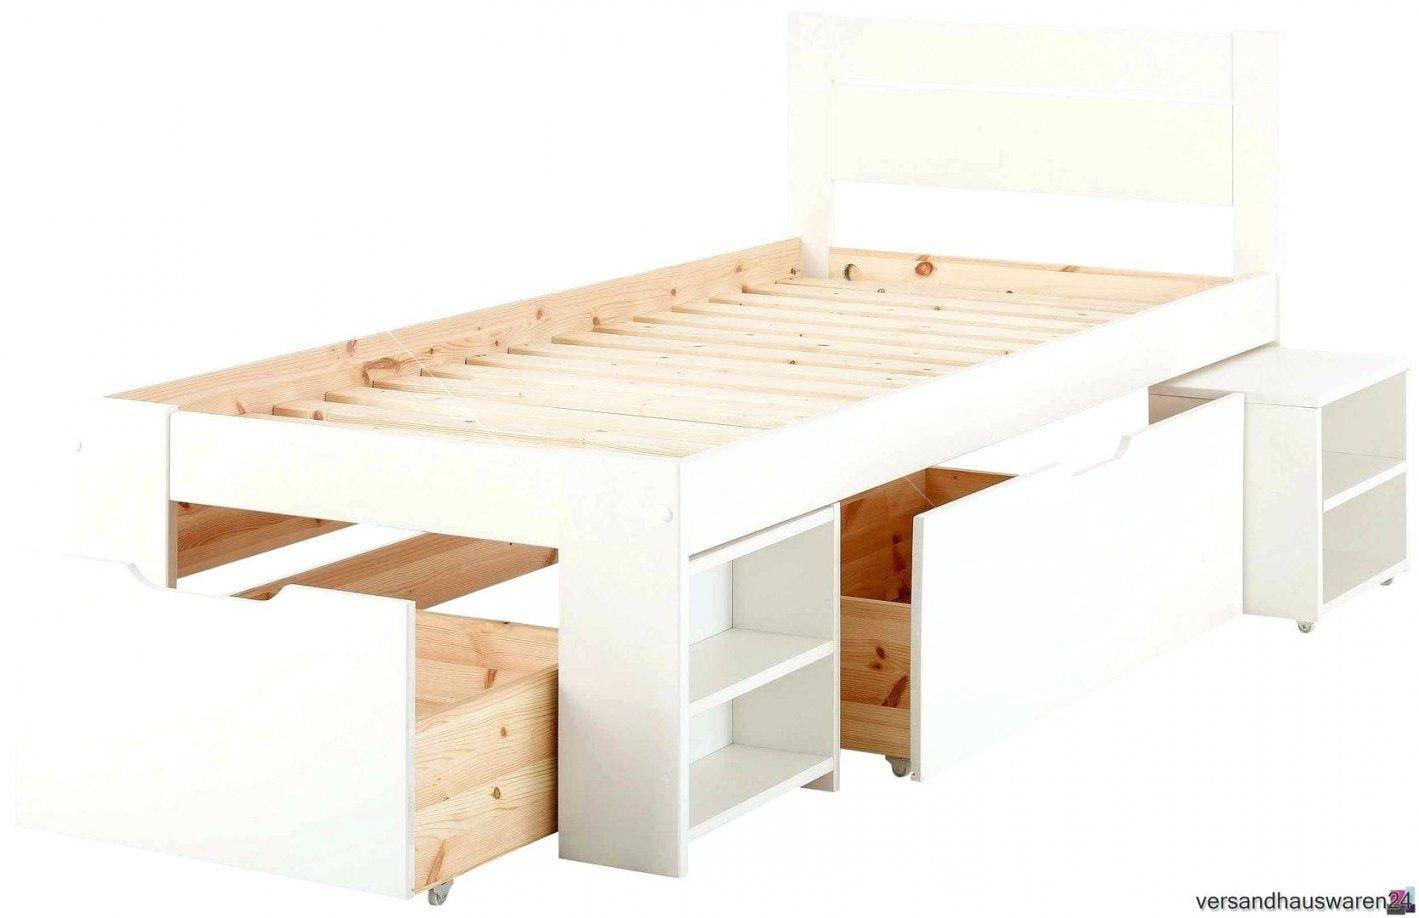 Full Size of Podestbett Ikea 3a Anleitung Beste Mbelideen Küche Kosten Betten Bei Miniküche Modulküche Kaufen Sofa Mit Schlaffunktion 160x200 Wohnzimmer Podestbett Ikea